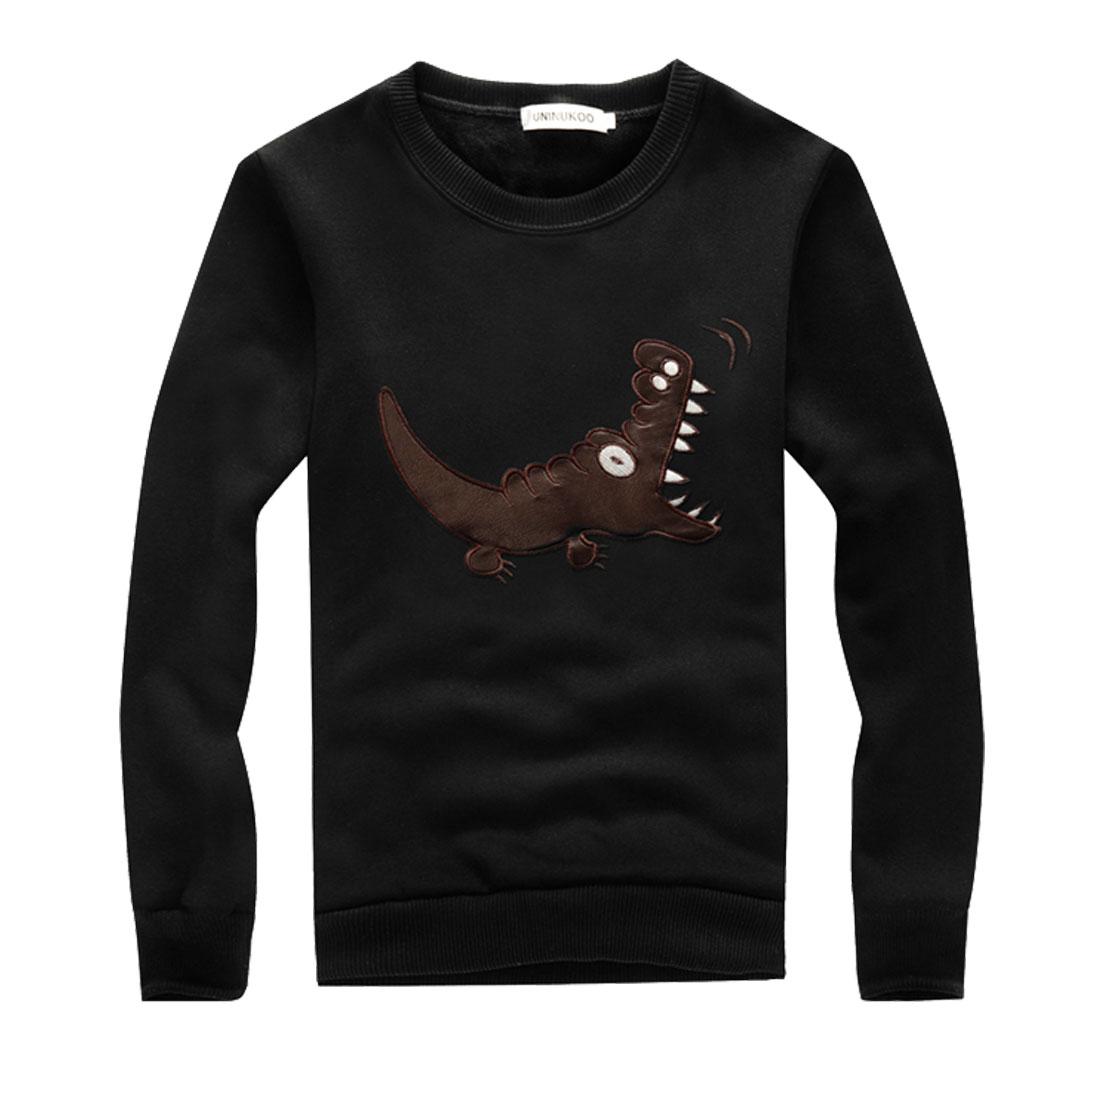 Men Long Sleeves Crocodile Printed Ribbed Hem Black Pullover Shirt M